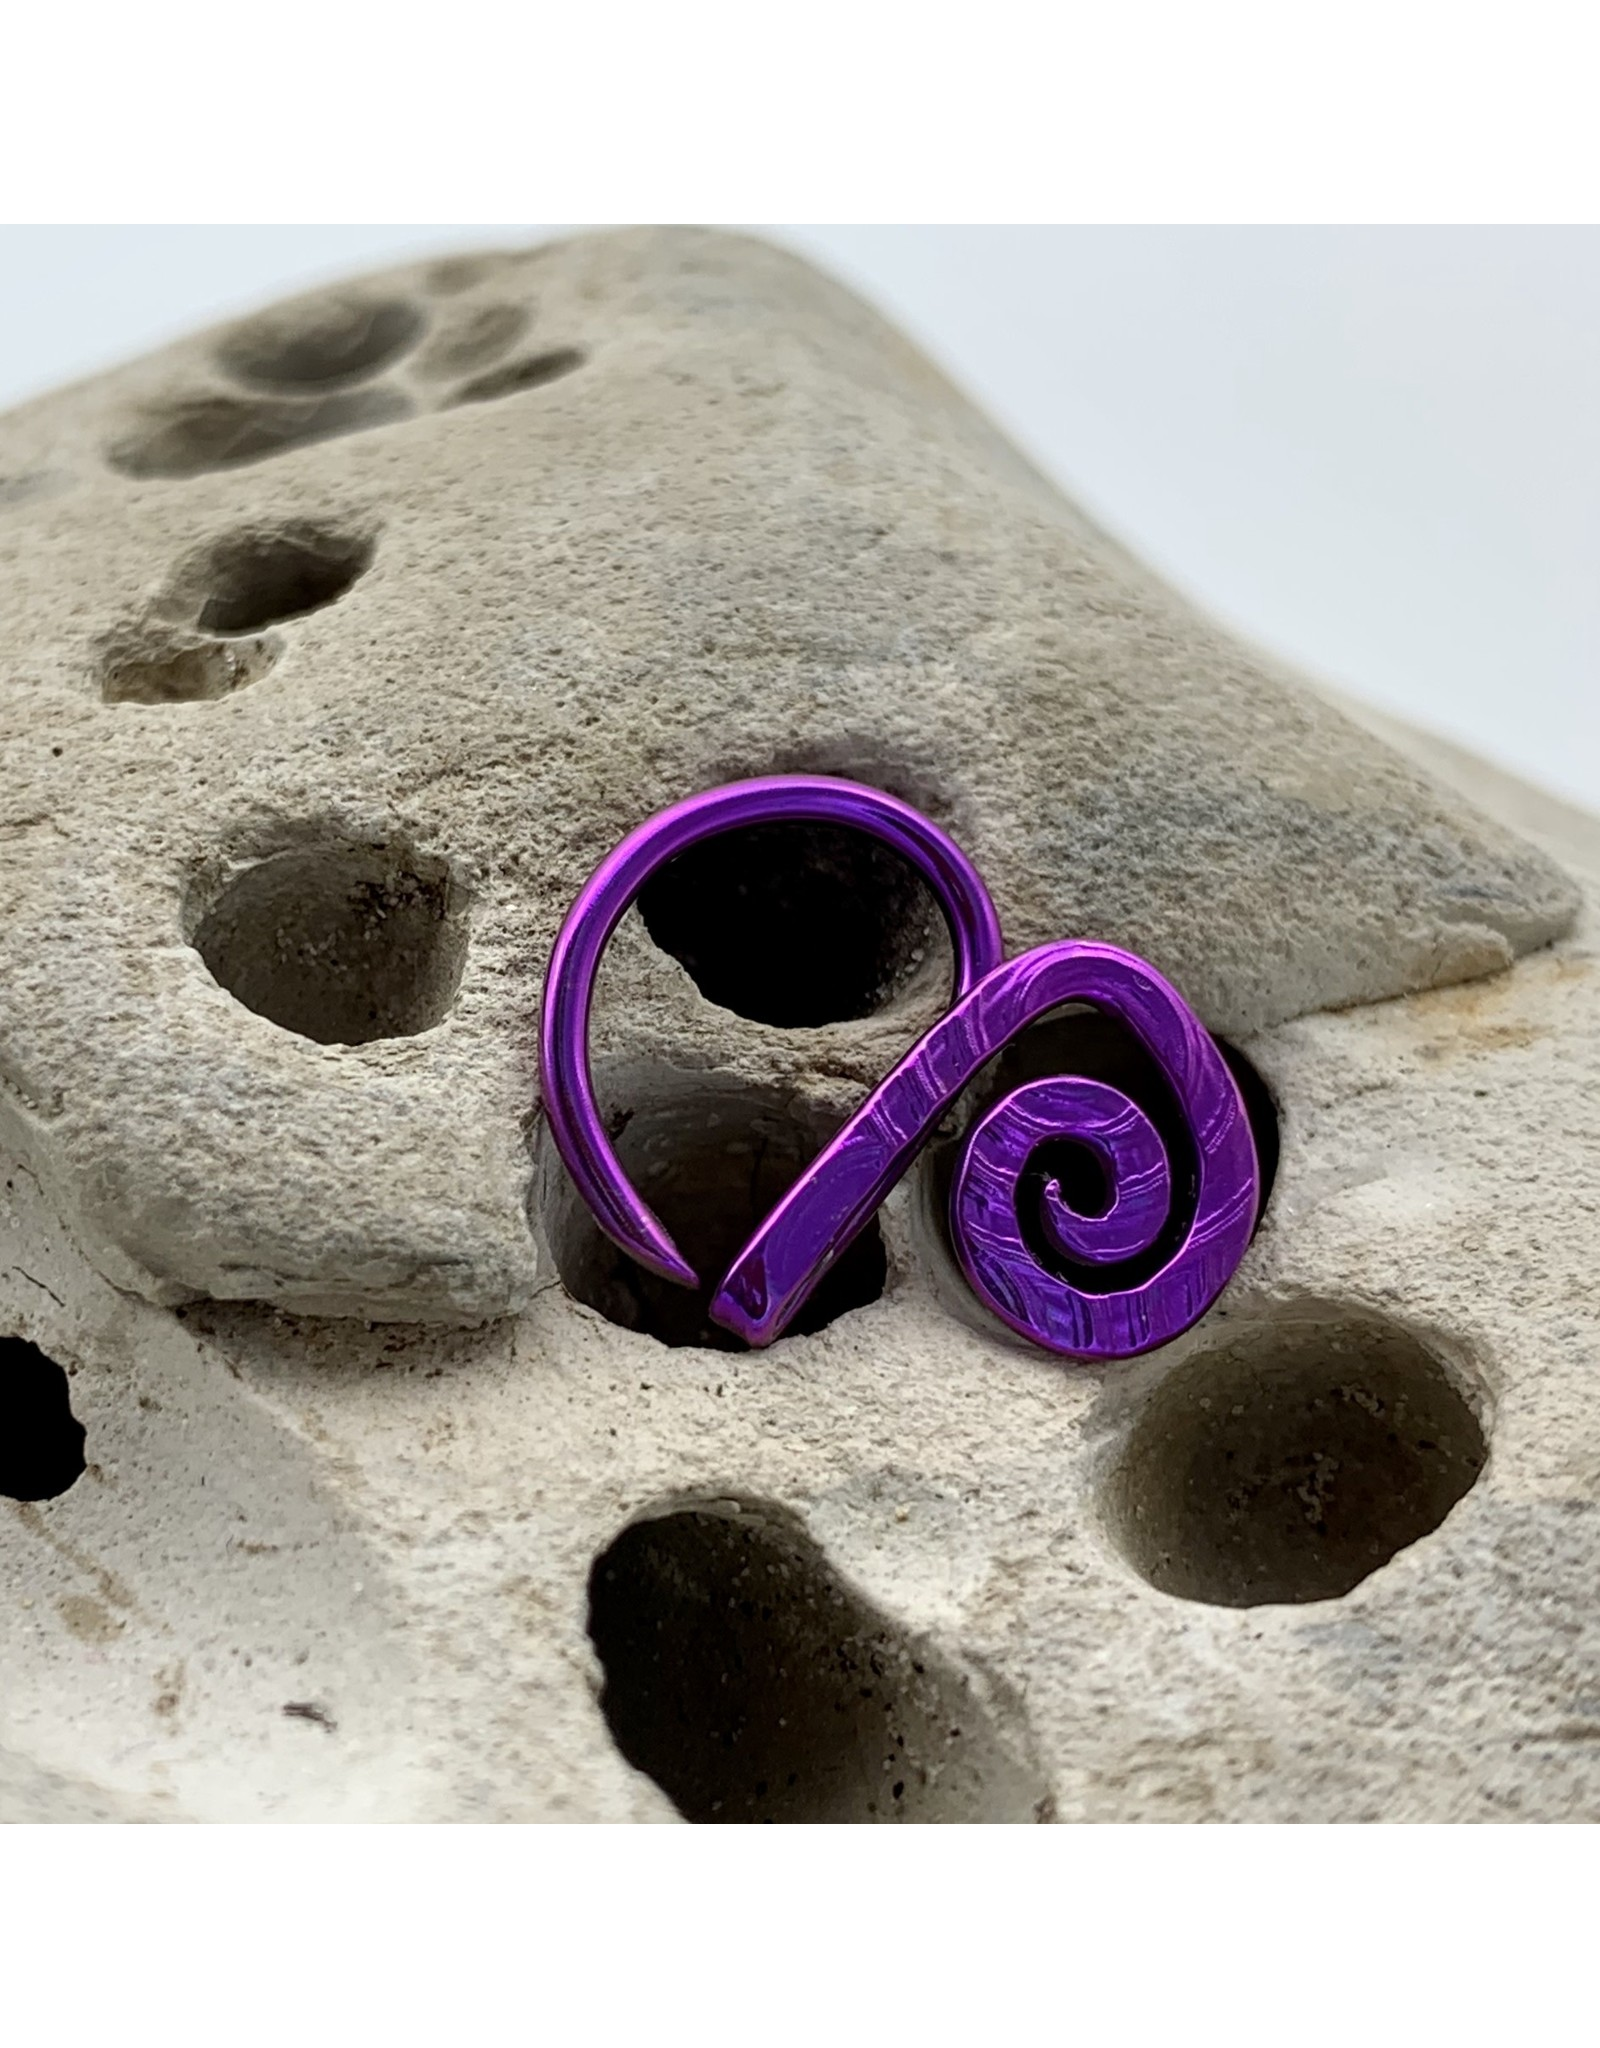 "Interstellar Jewelry Productions Interstellar Jewelry 16g 7/16 niobium embossed ""Procylon Variation"" Daith seam ring"